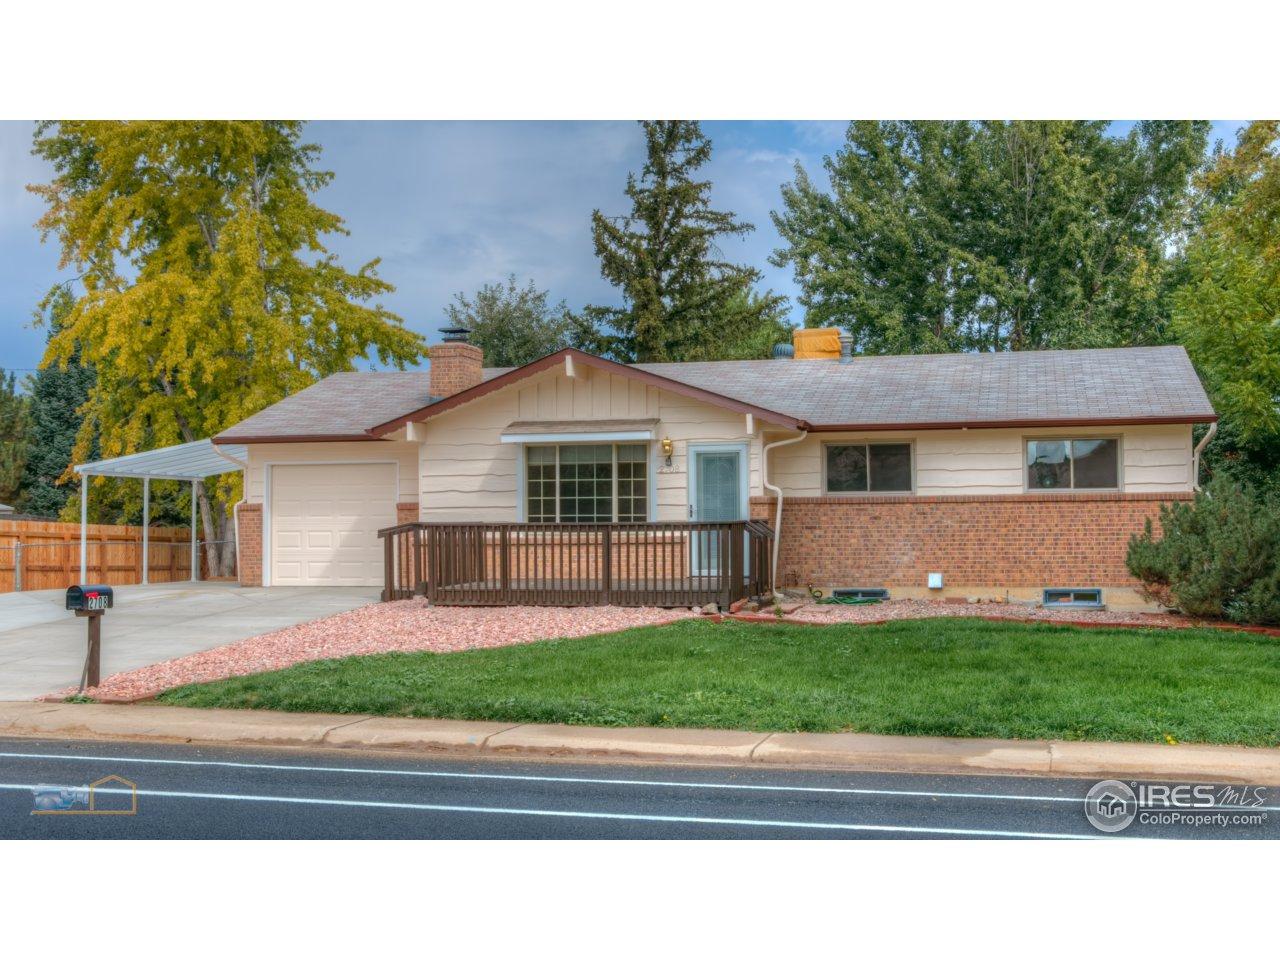 2708 Mountain View Ave, Longmont CO 80503